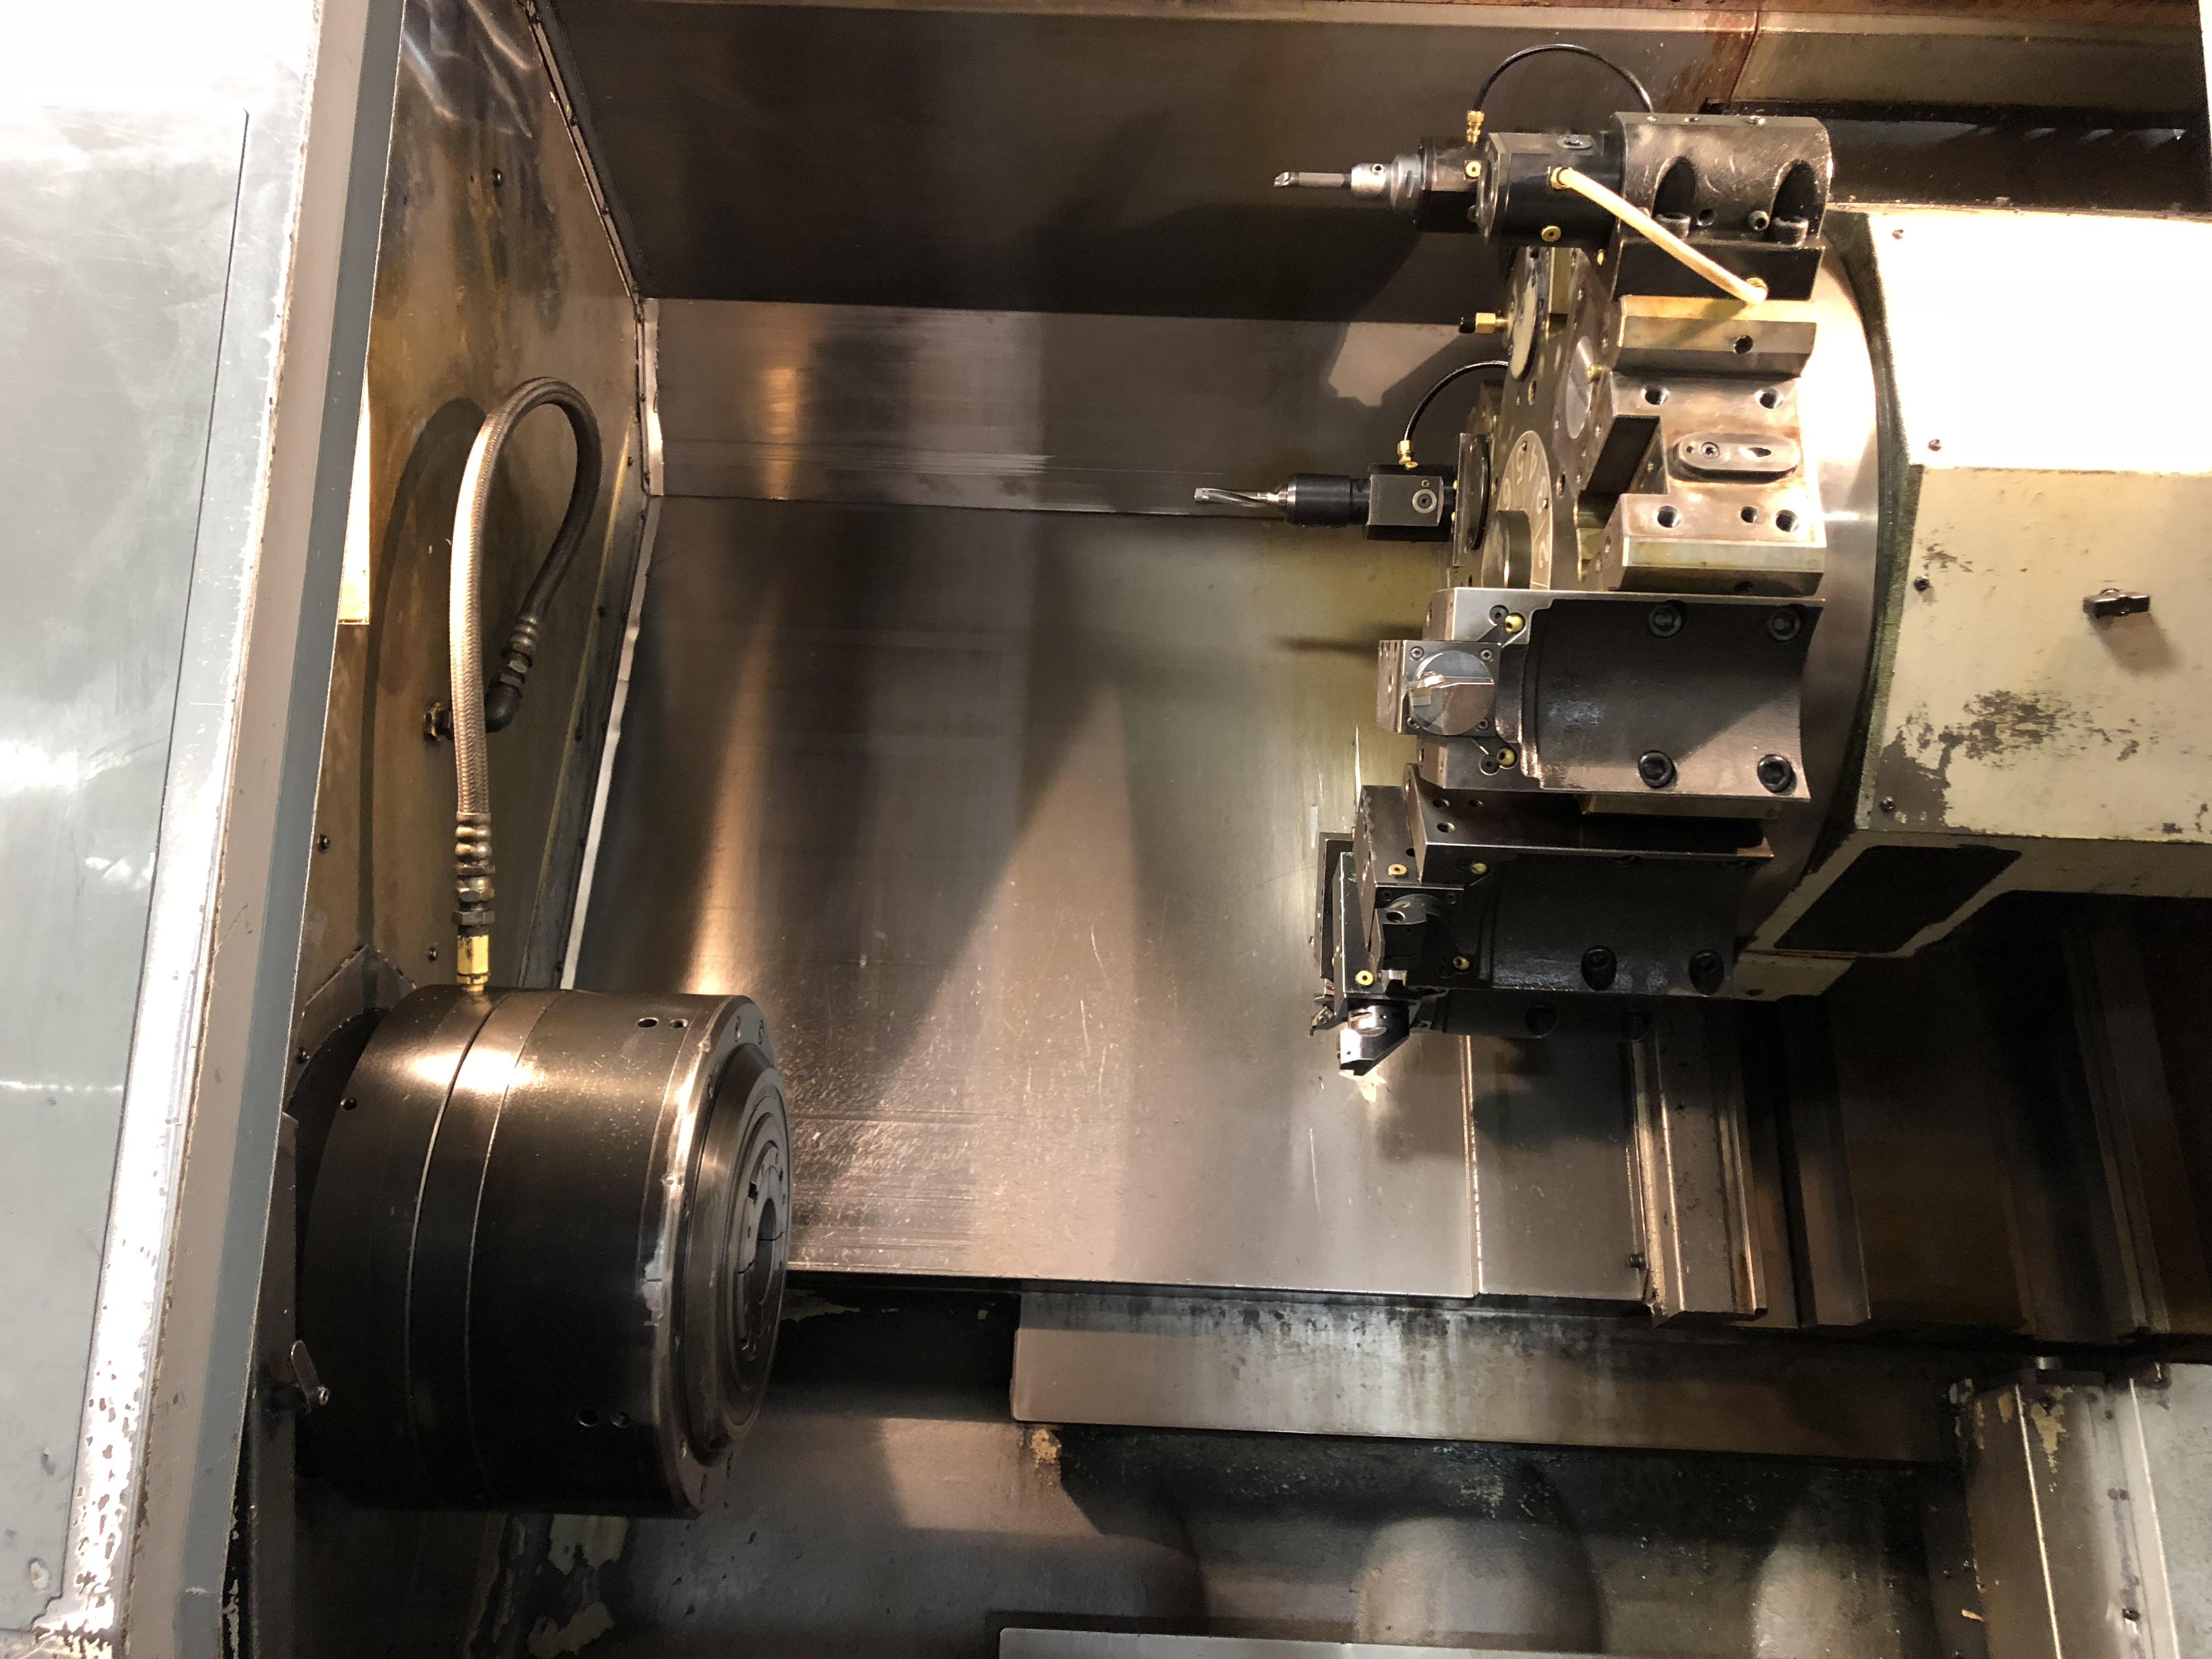 Lot 1 - 1994 Mori Seiki SL-45MC/1000 CNC live tool turning center, Mori T6F11 control, chip conveyor, flex